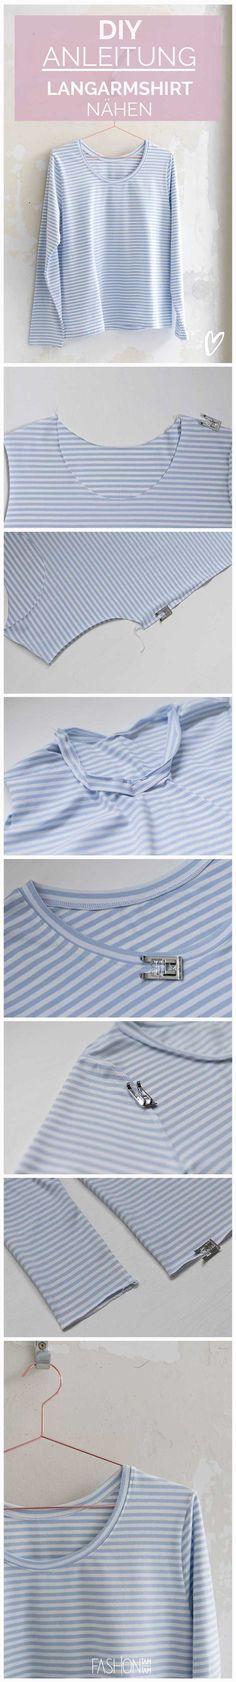 How to Shirt mit langen Ärmeln nähen, Anleitung T-Shirt nähen, Longsleeve nähen, Shirt nähen, Ärmel verarbeiten, Ärmel nähen, T-Shirt mit Streifen nähen, T-Shirt Selbermachen, Streifenhirt annähen, Anleitung Ärmel nähen, T-Shirt mit langen Ärmel nähen, T-Shirt Selbermachen, Ärmel mit nähen, Nähen für Anfänger, Nähen leicht, leicht Nähen, DIY Shirt, Streifenshirt, Streifenhirt nähen, T-Shirt nähen Overlock, DIY Longsleeve